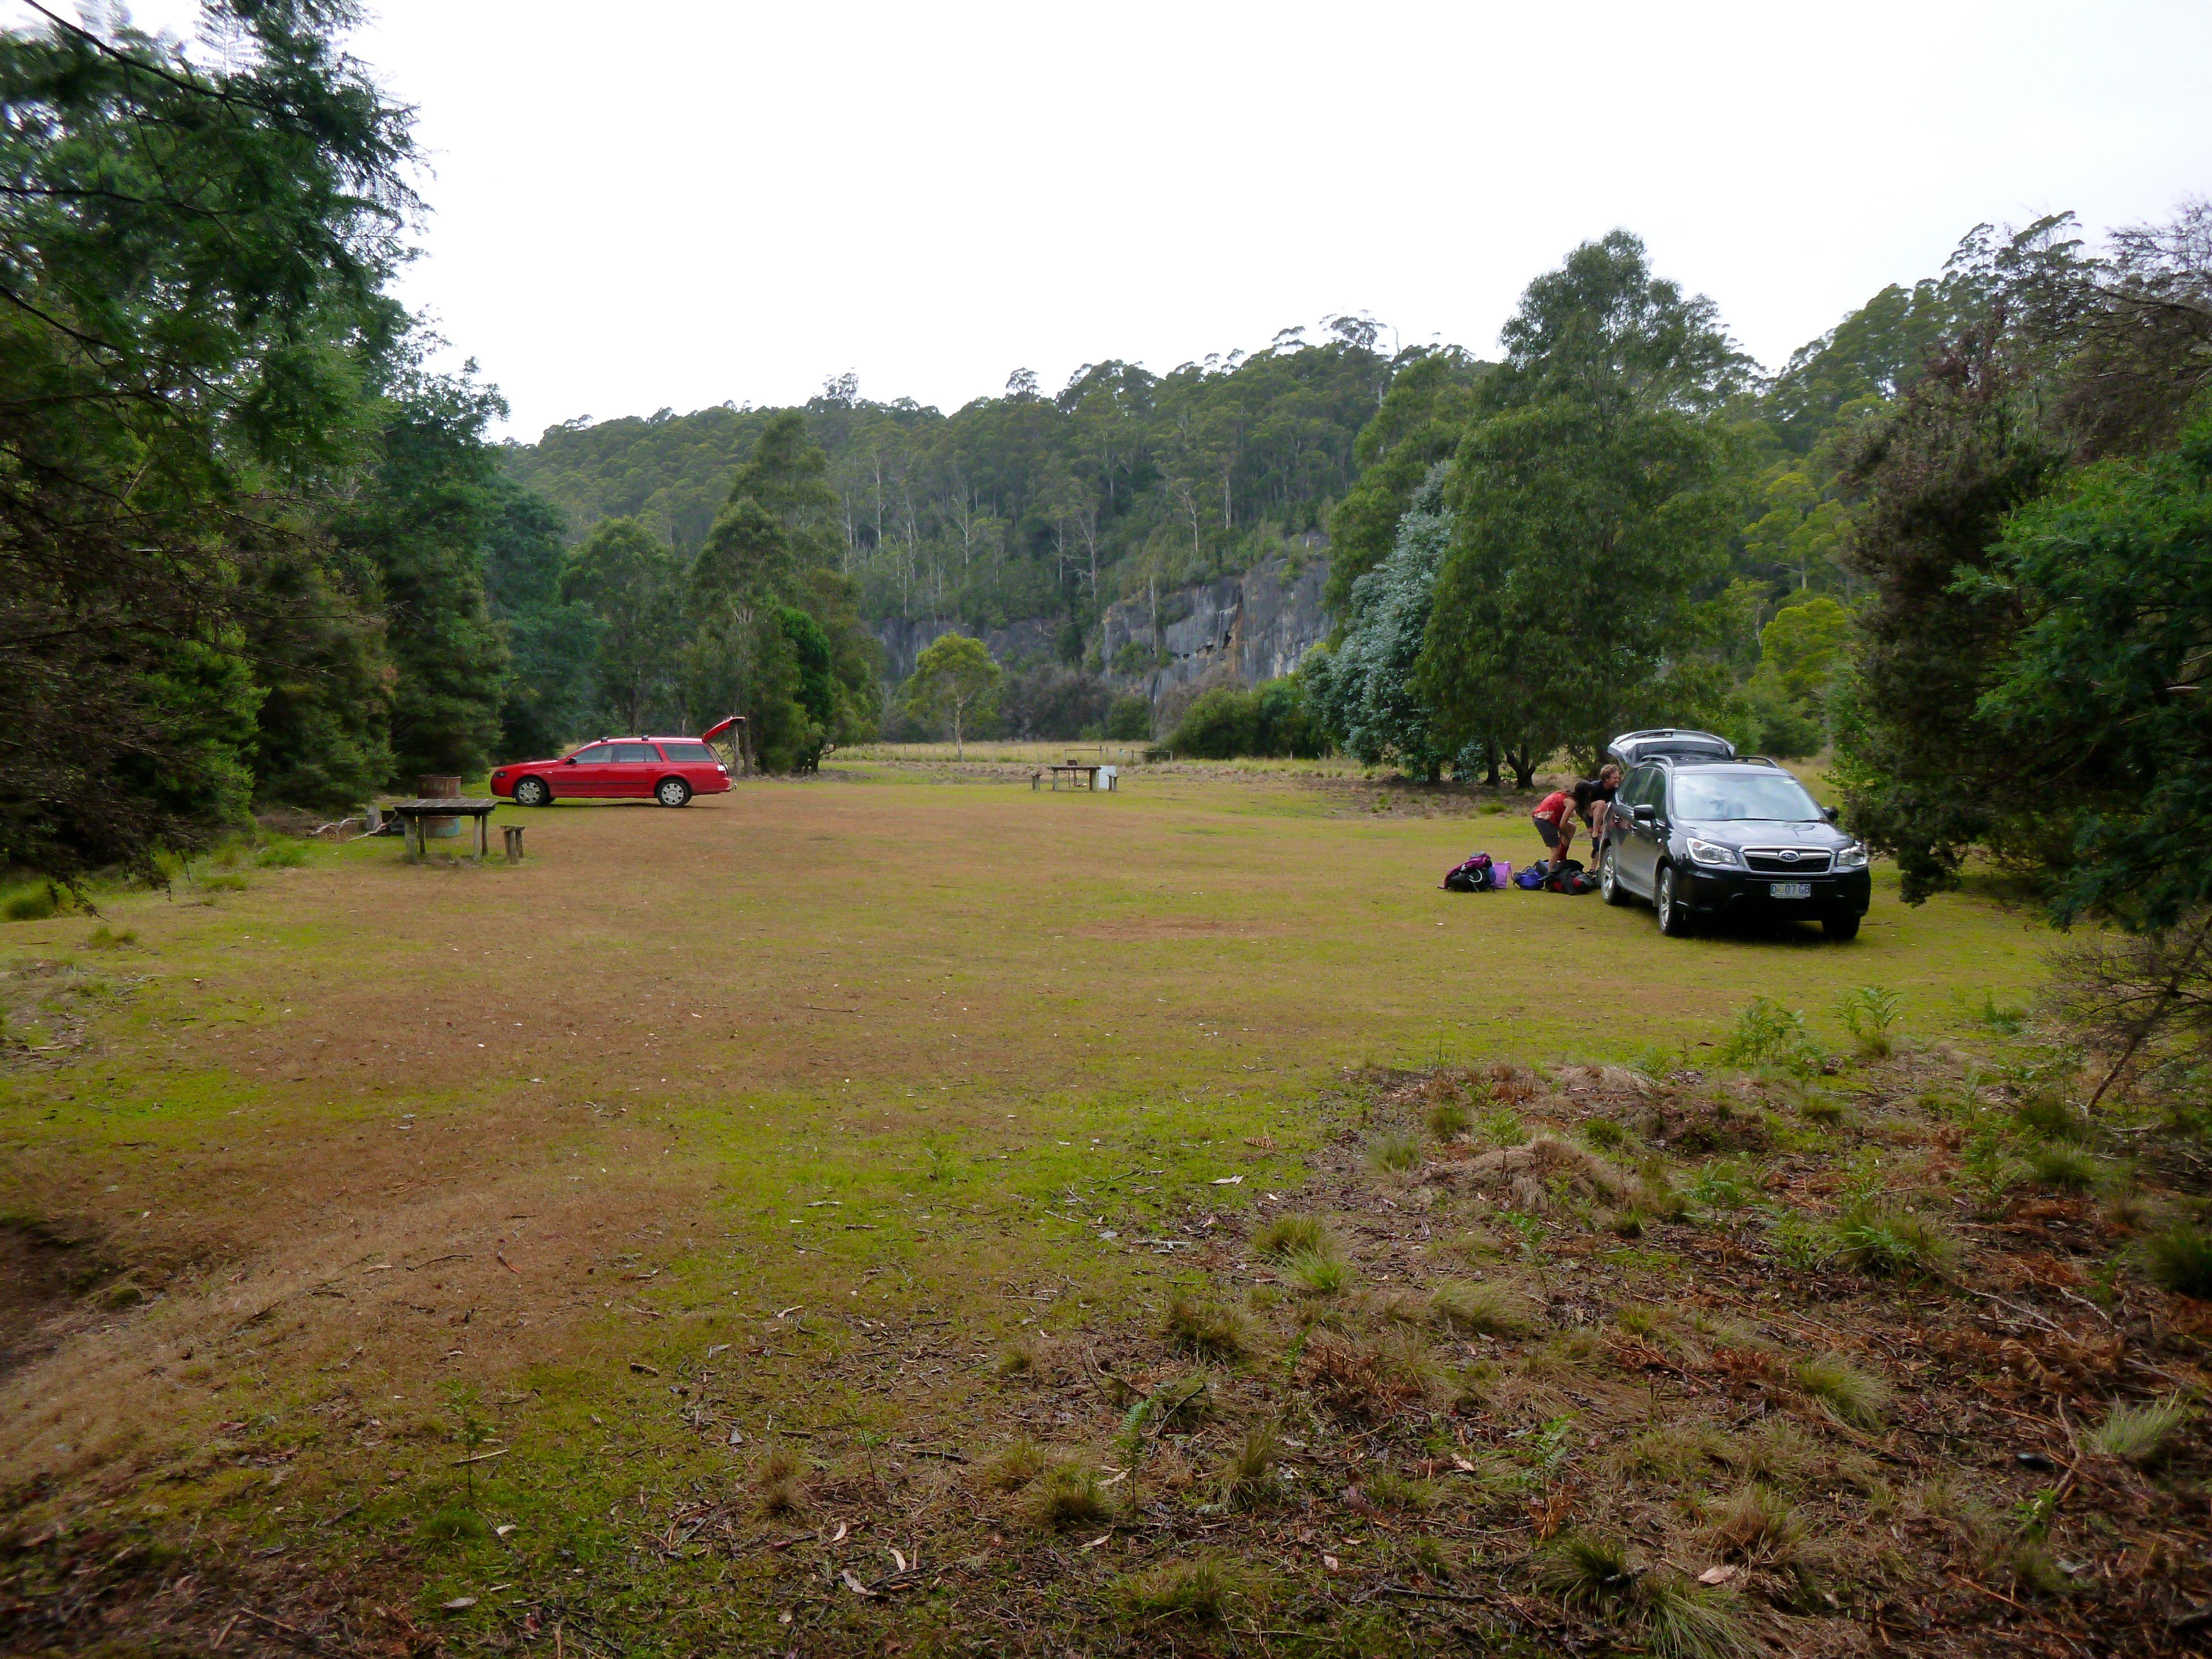 Picnic ground turned car park